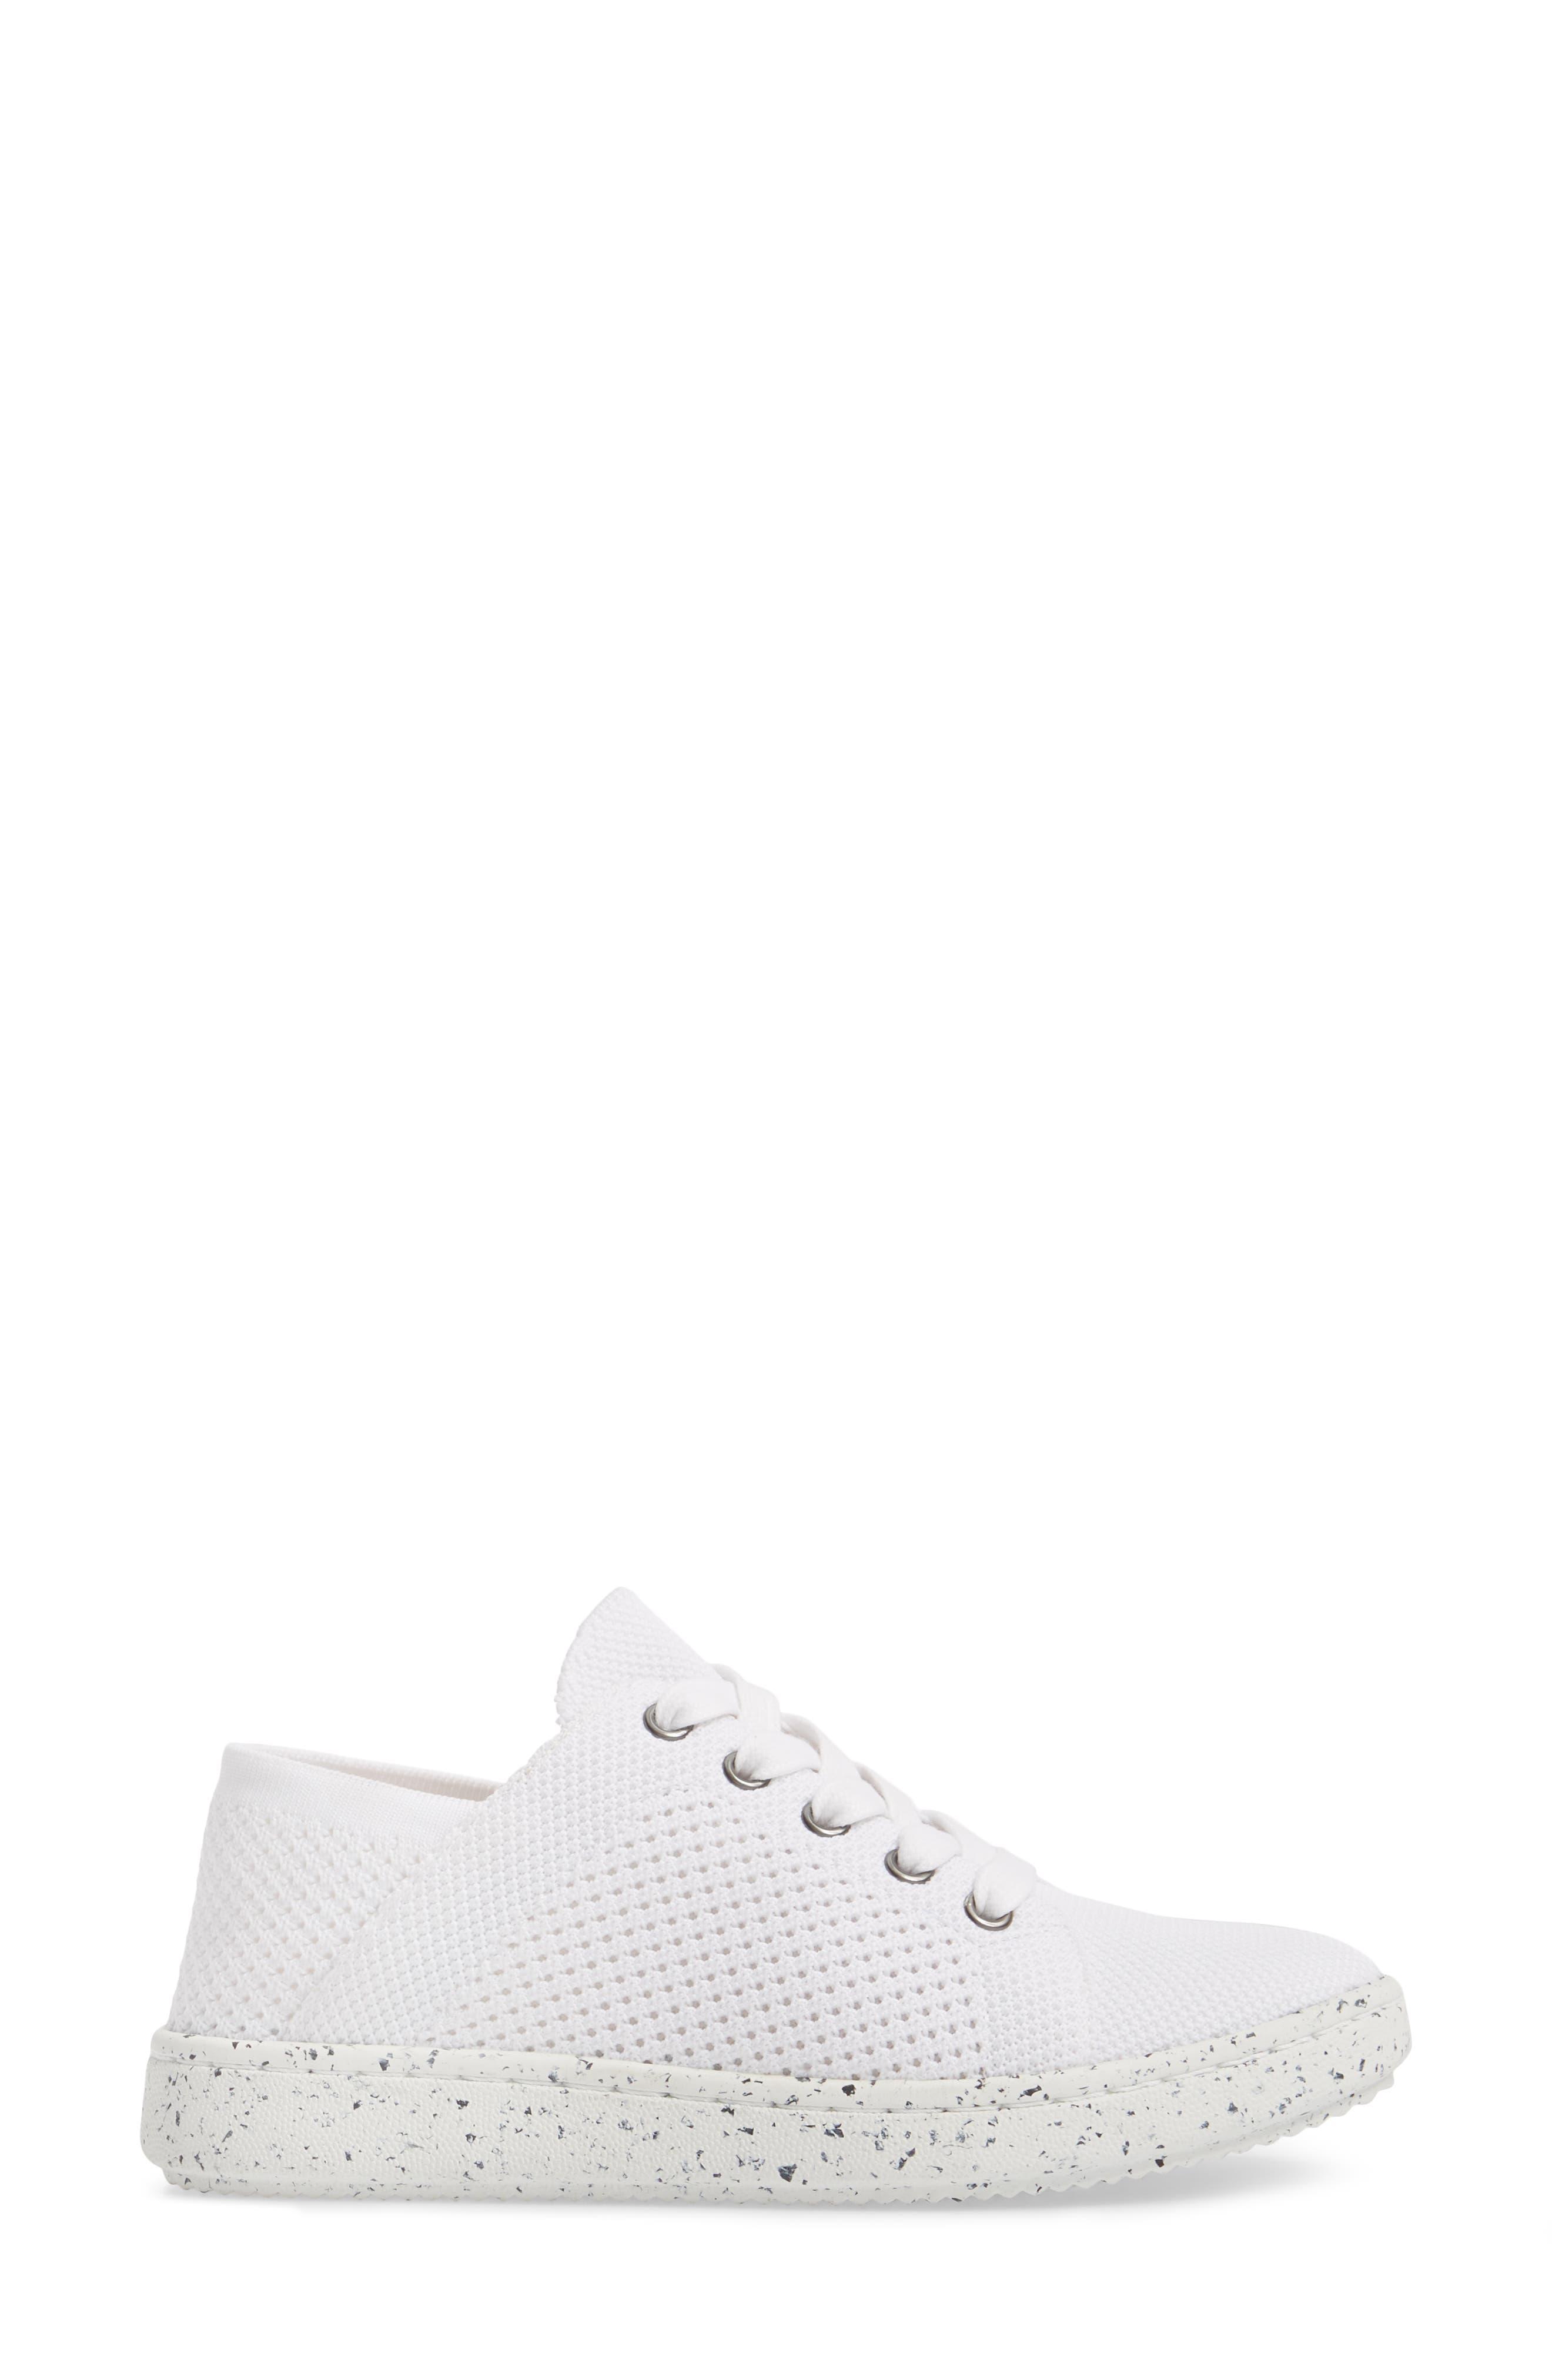 Clifton Sneaker,                             Alternate thumbnail 3, color,                             White Fabric